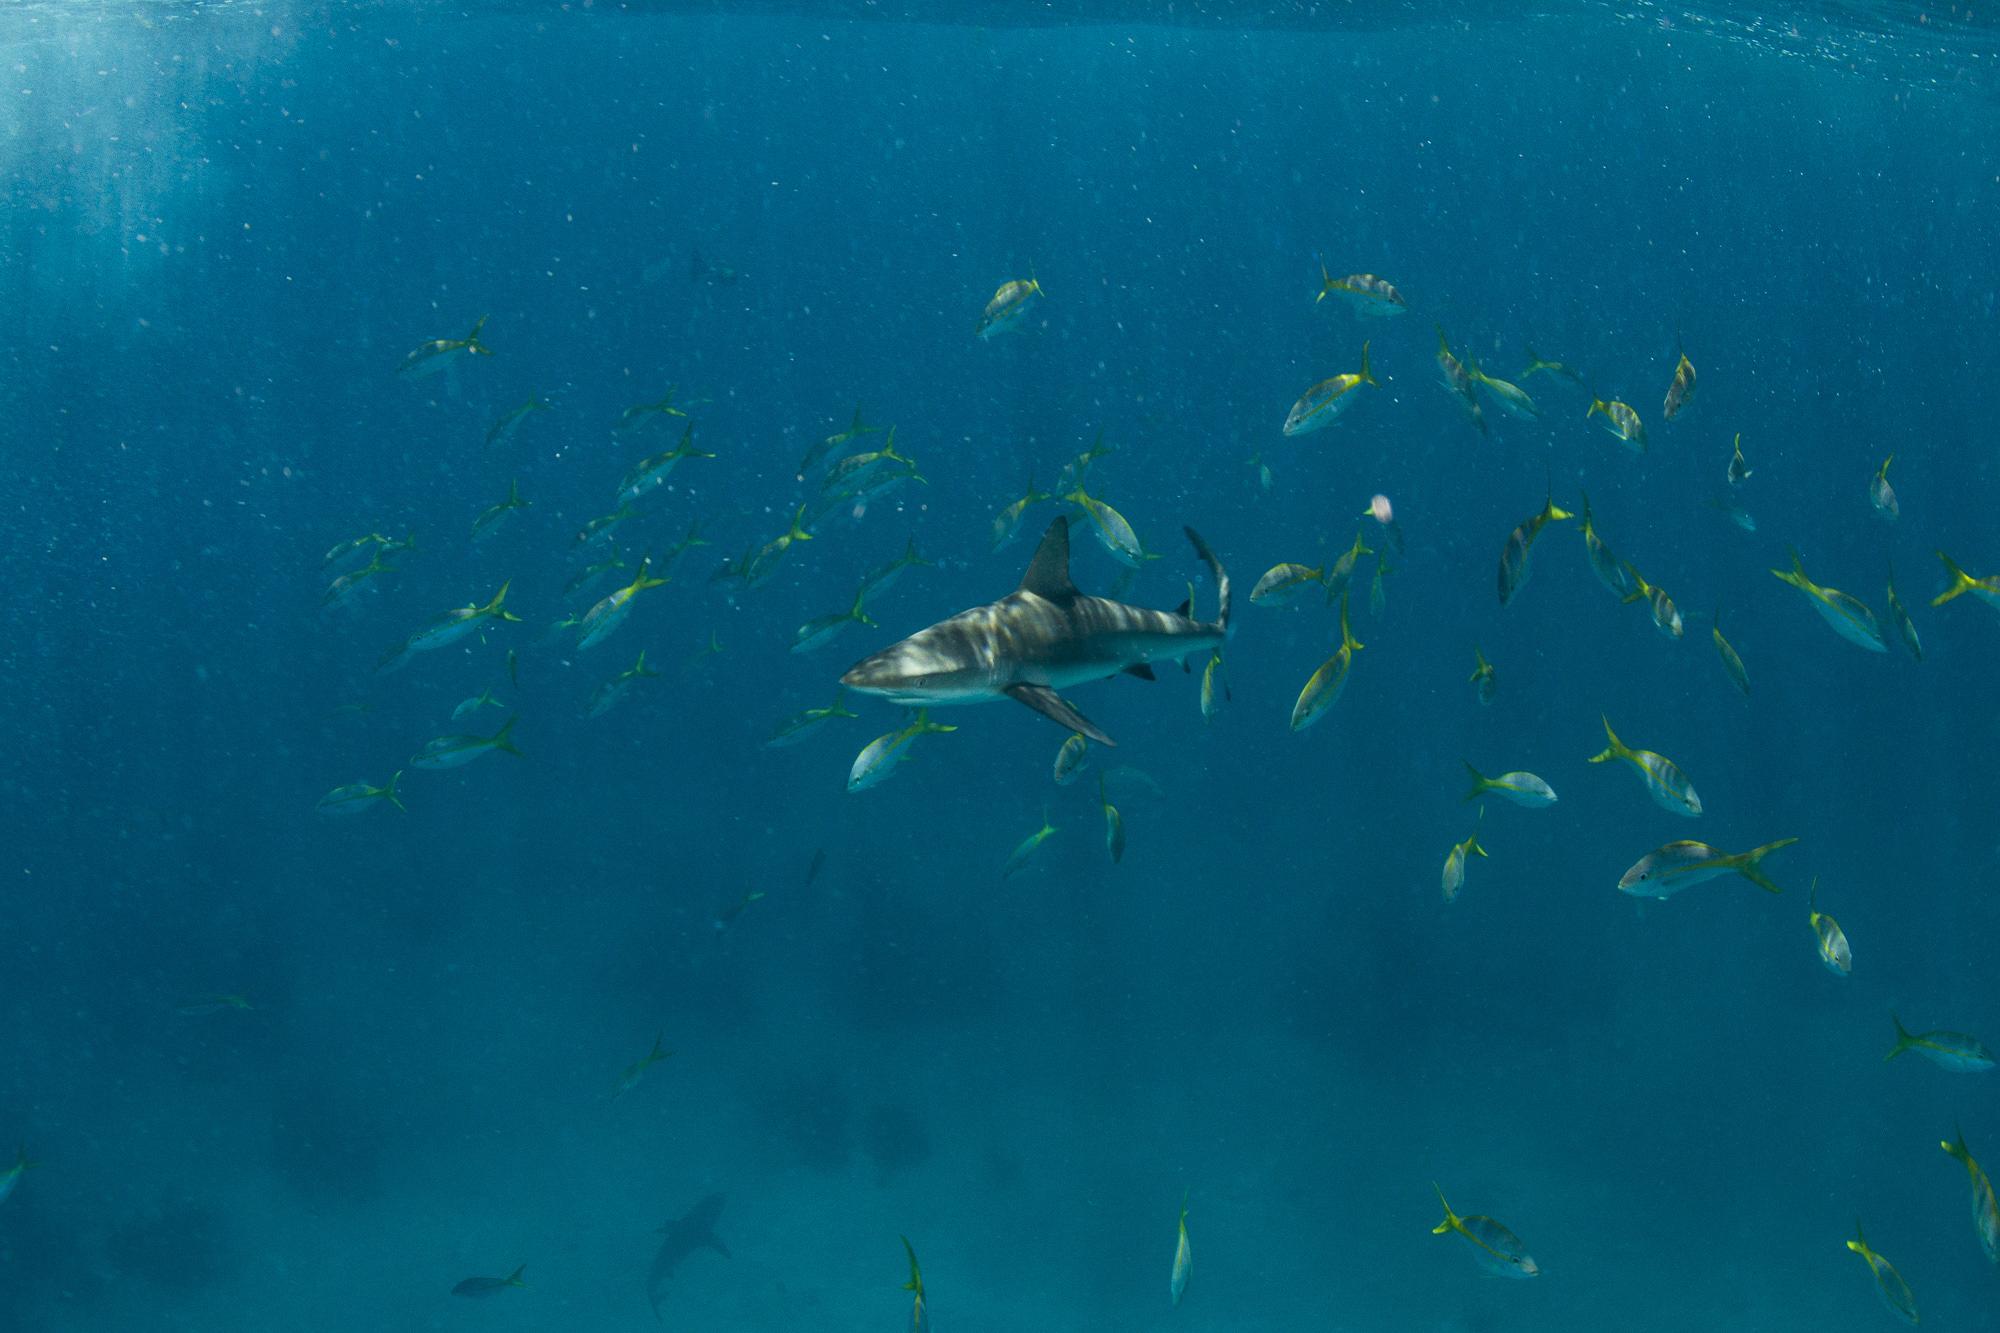 A bold Caribbean reef shark moves towards the surface